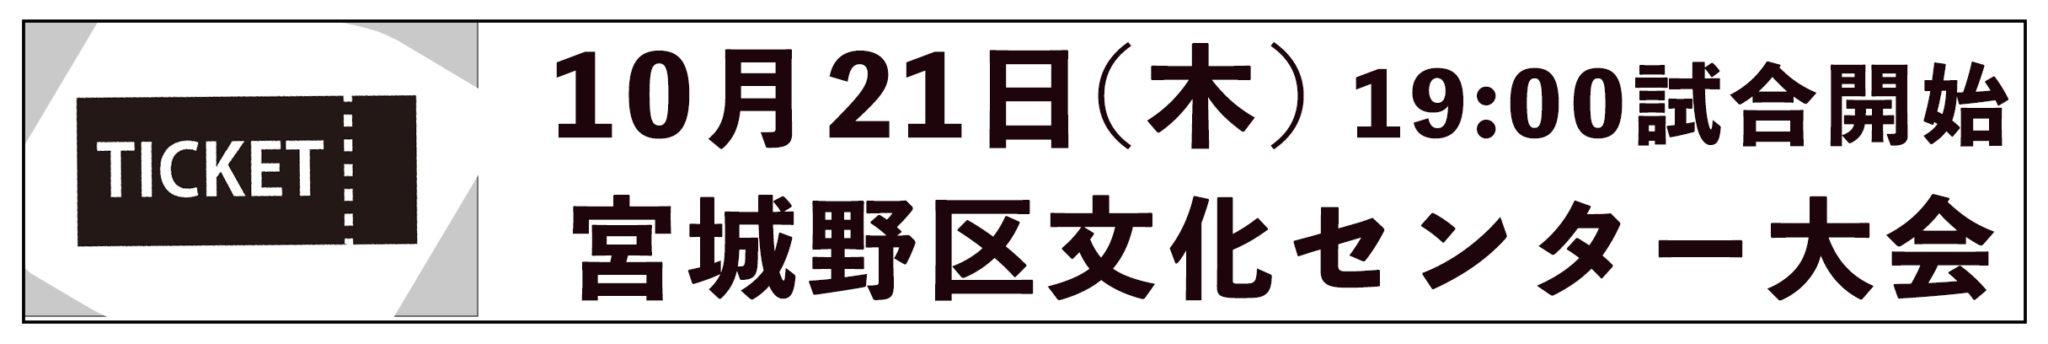 10/21